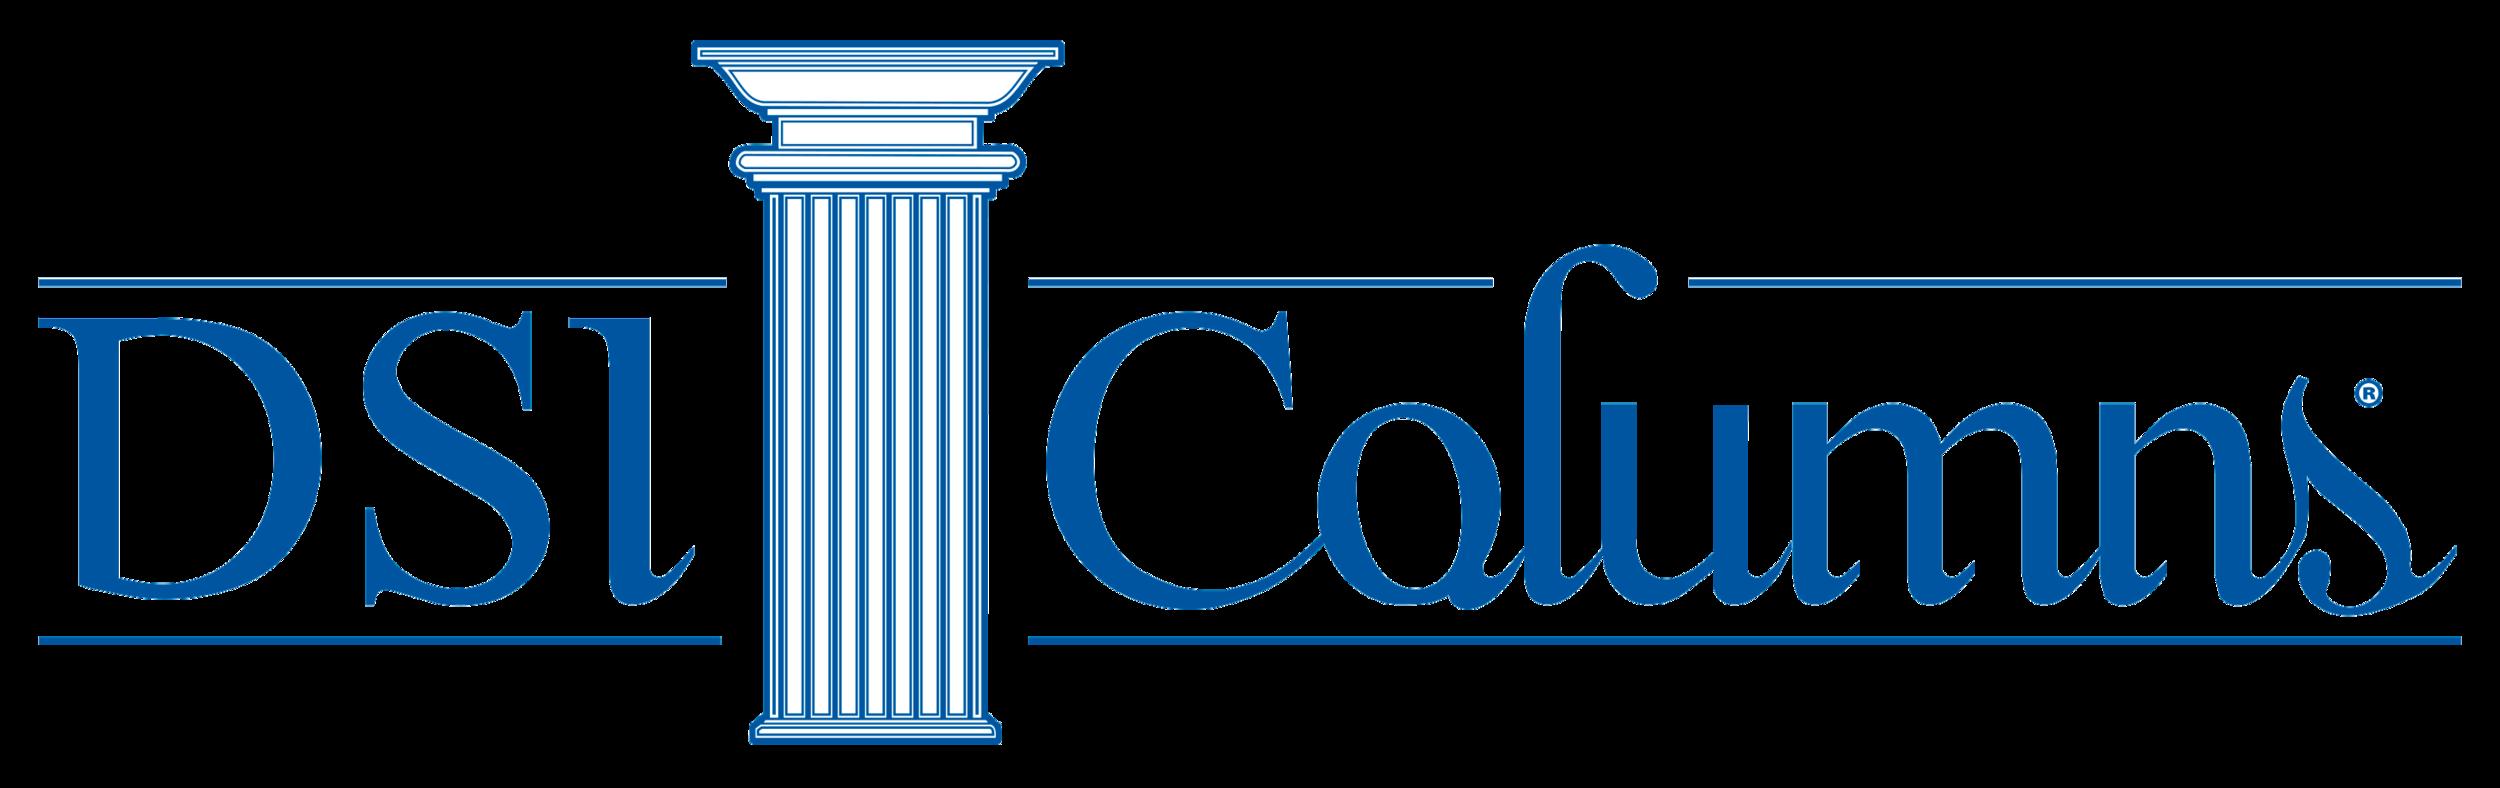 DSI Columns Logo.png